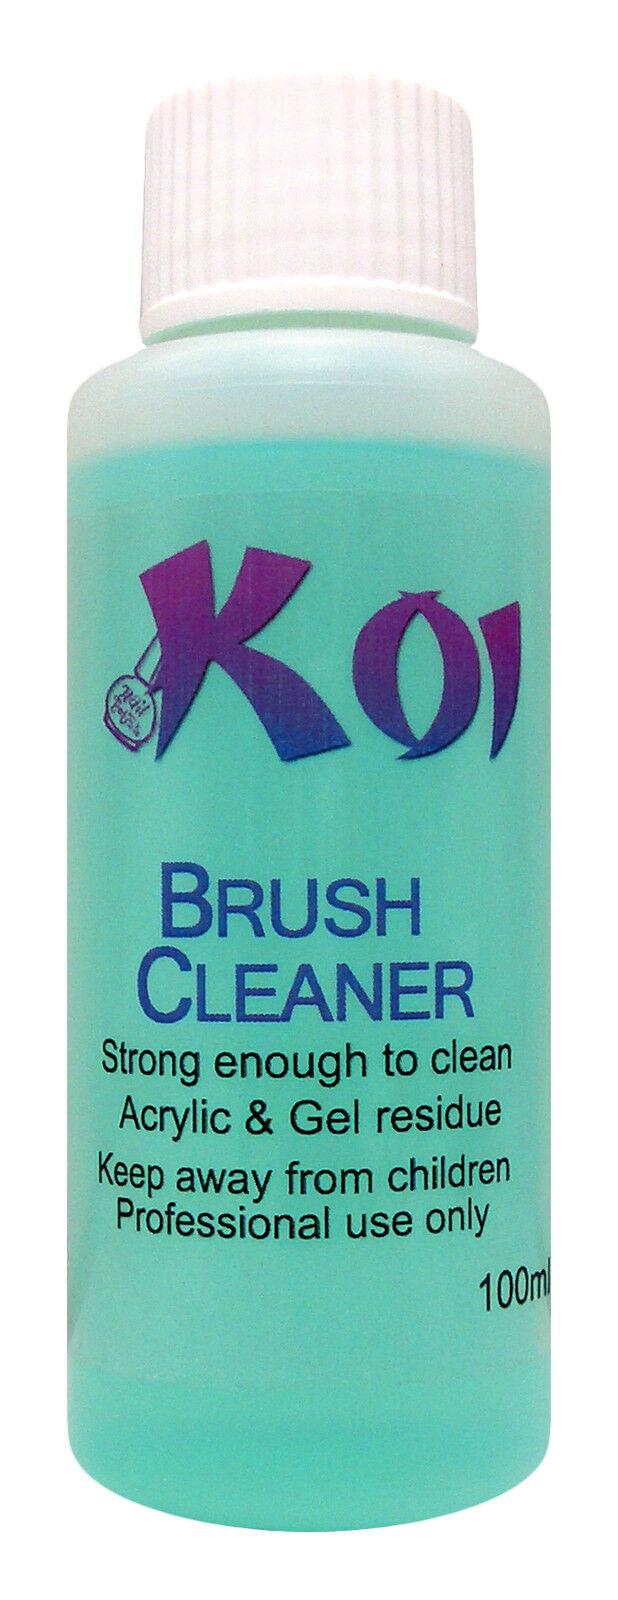 Acrylic Brush Cleaner